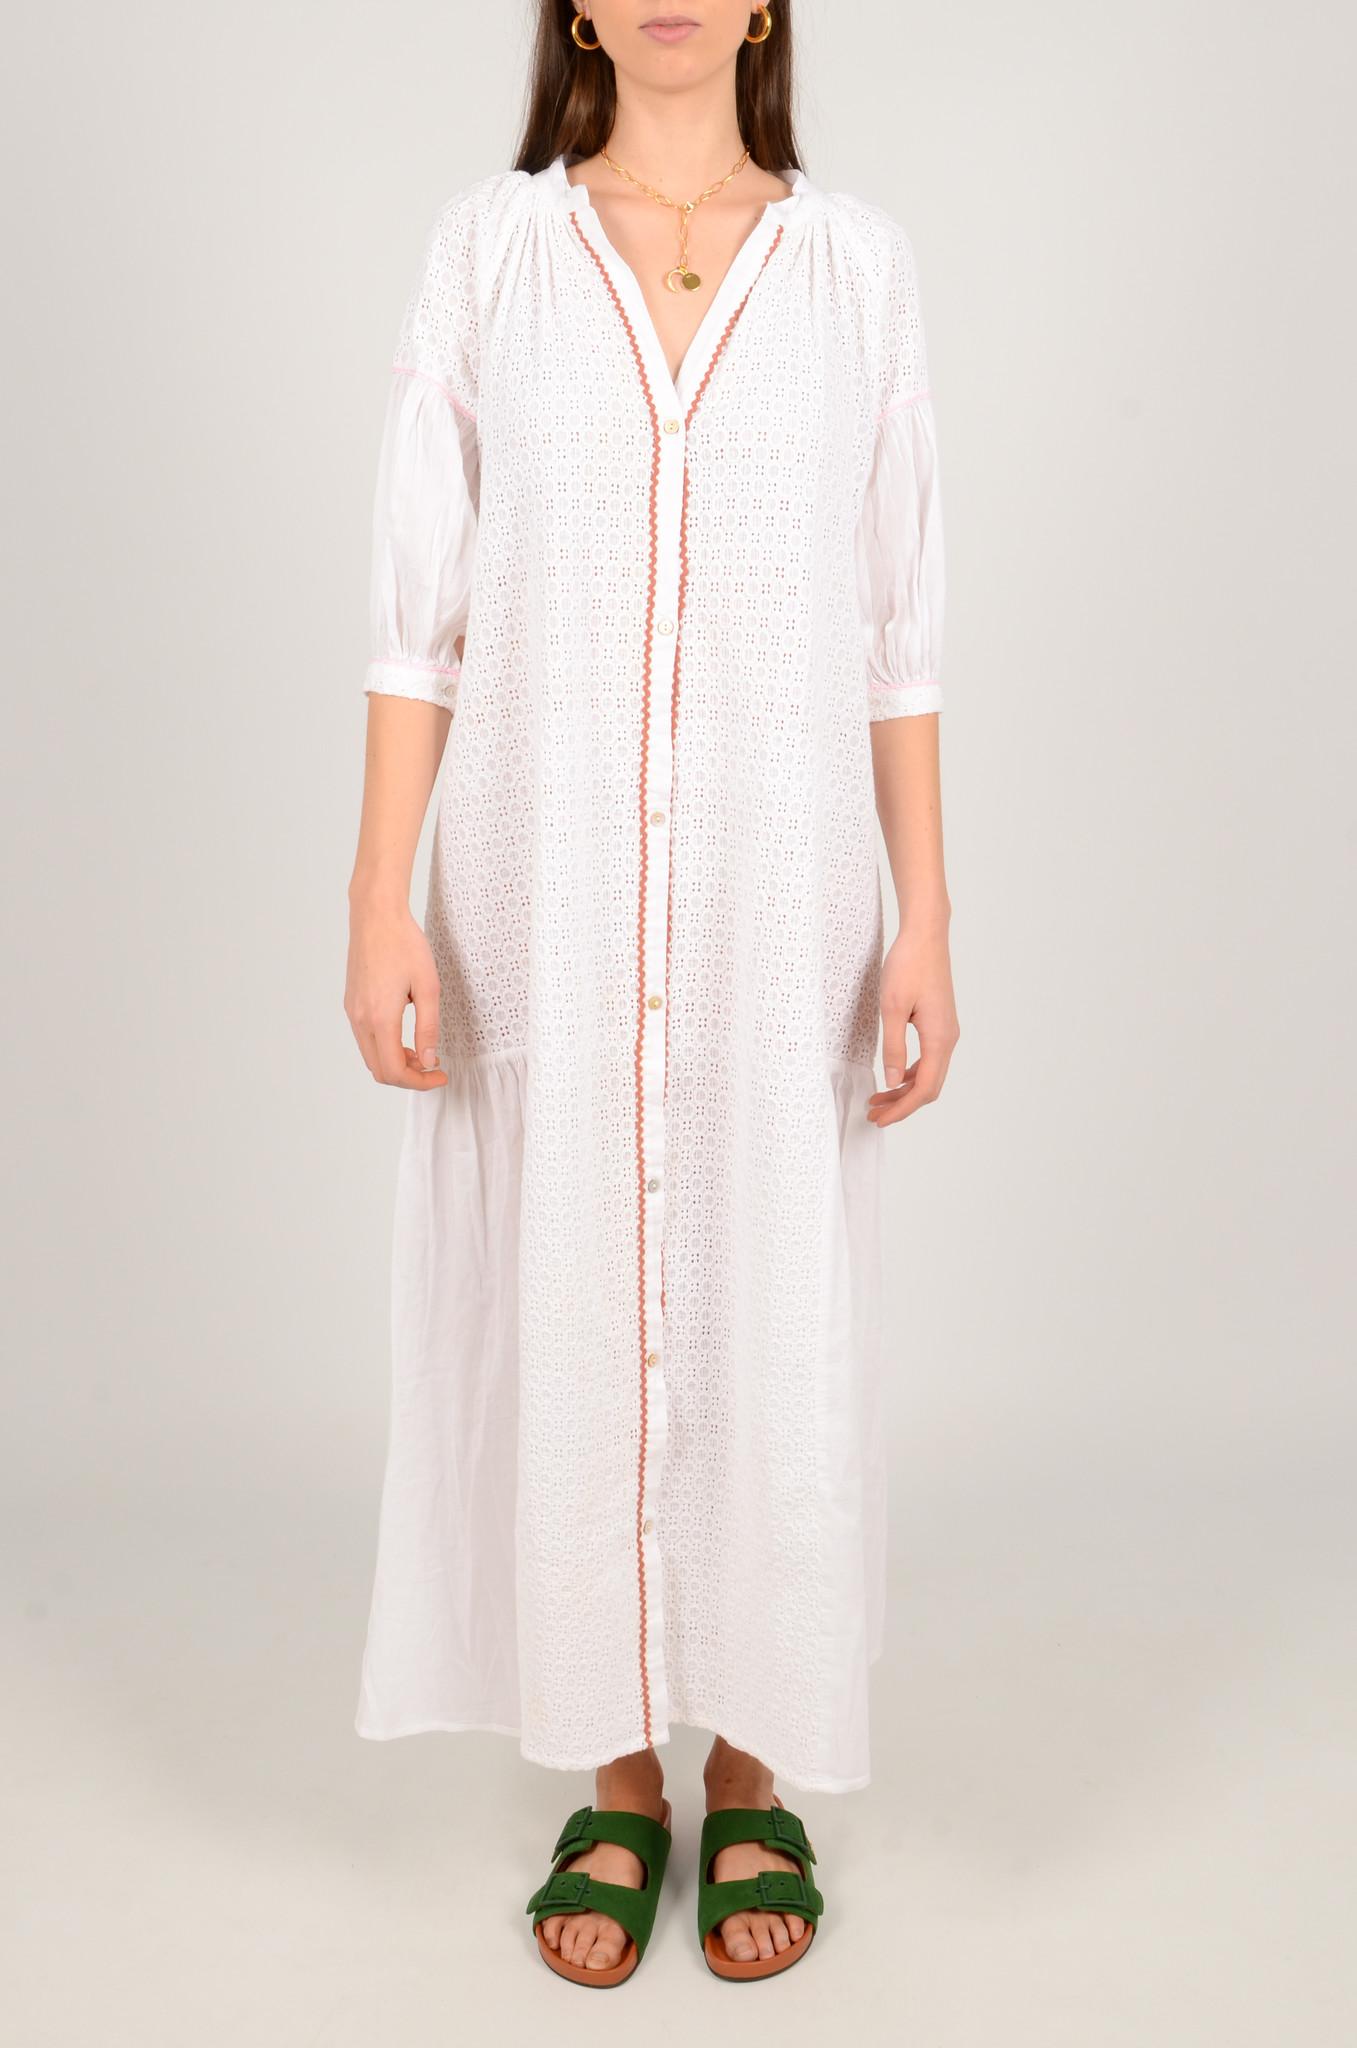 MANISE DRESS-1